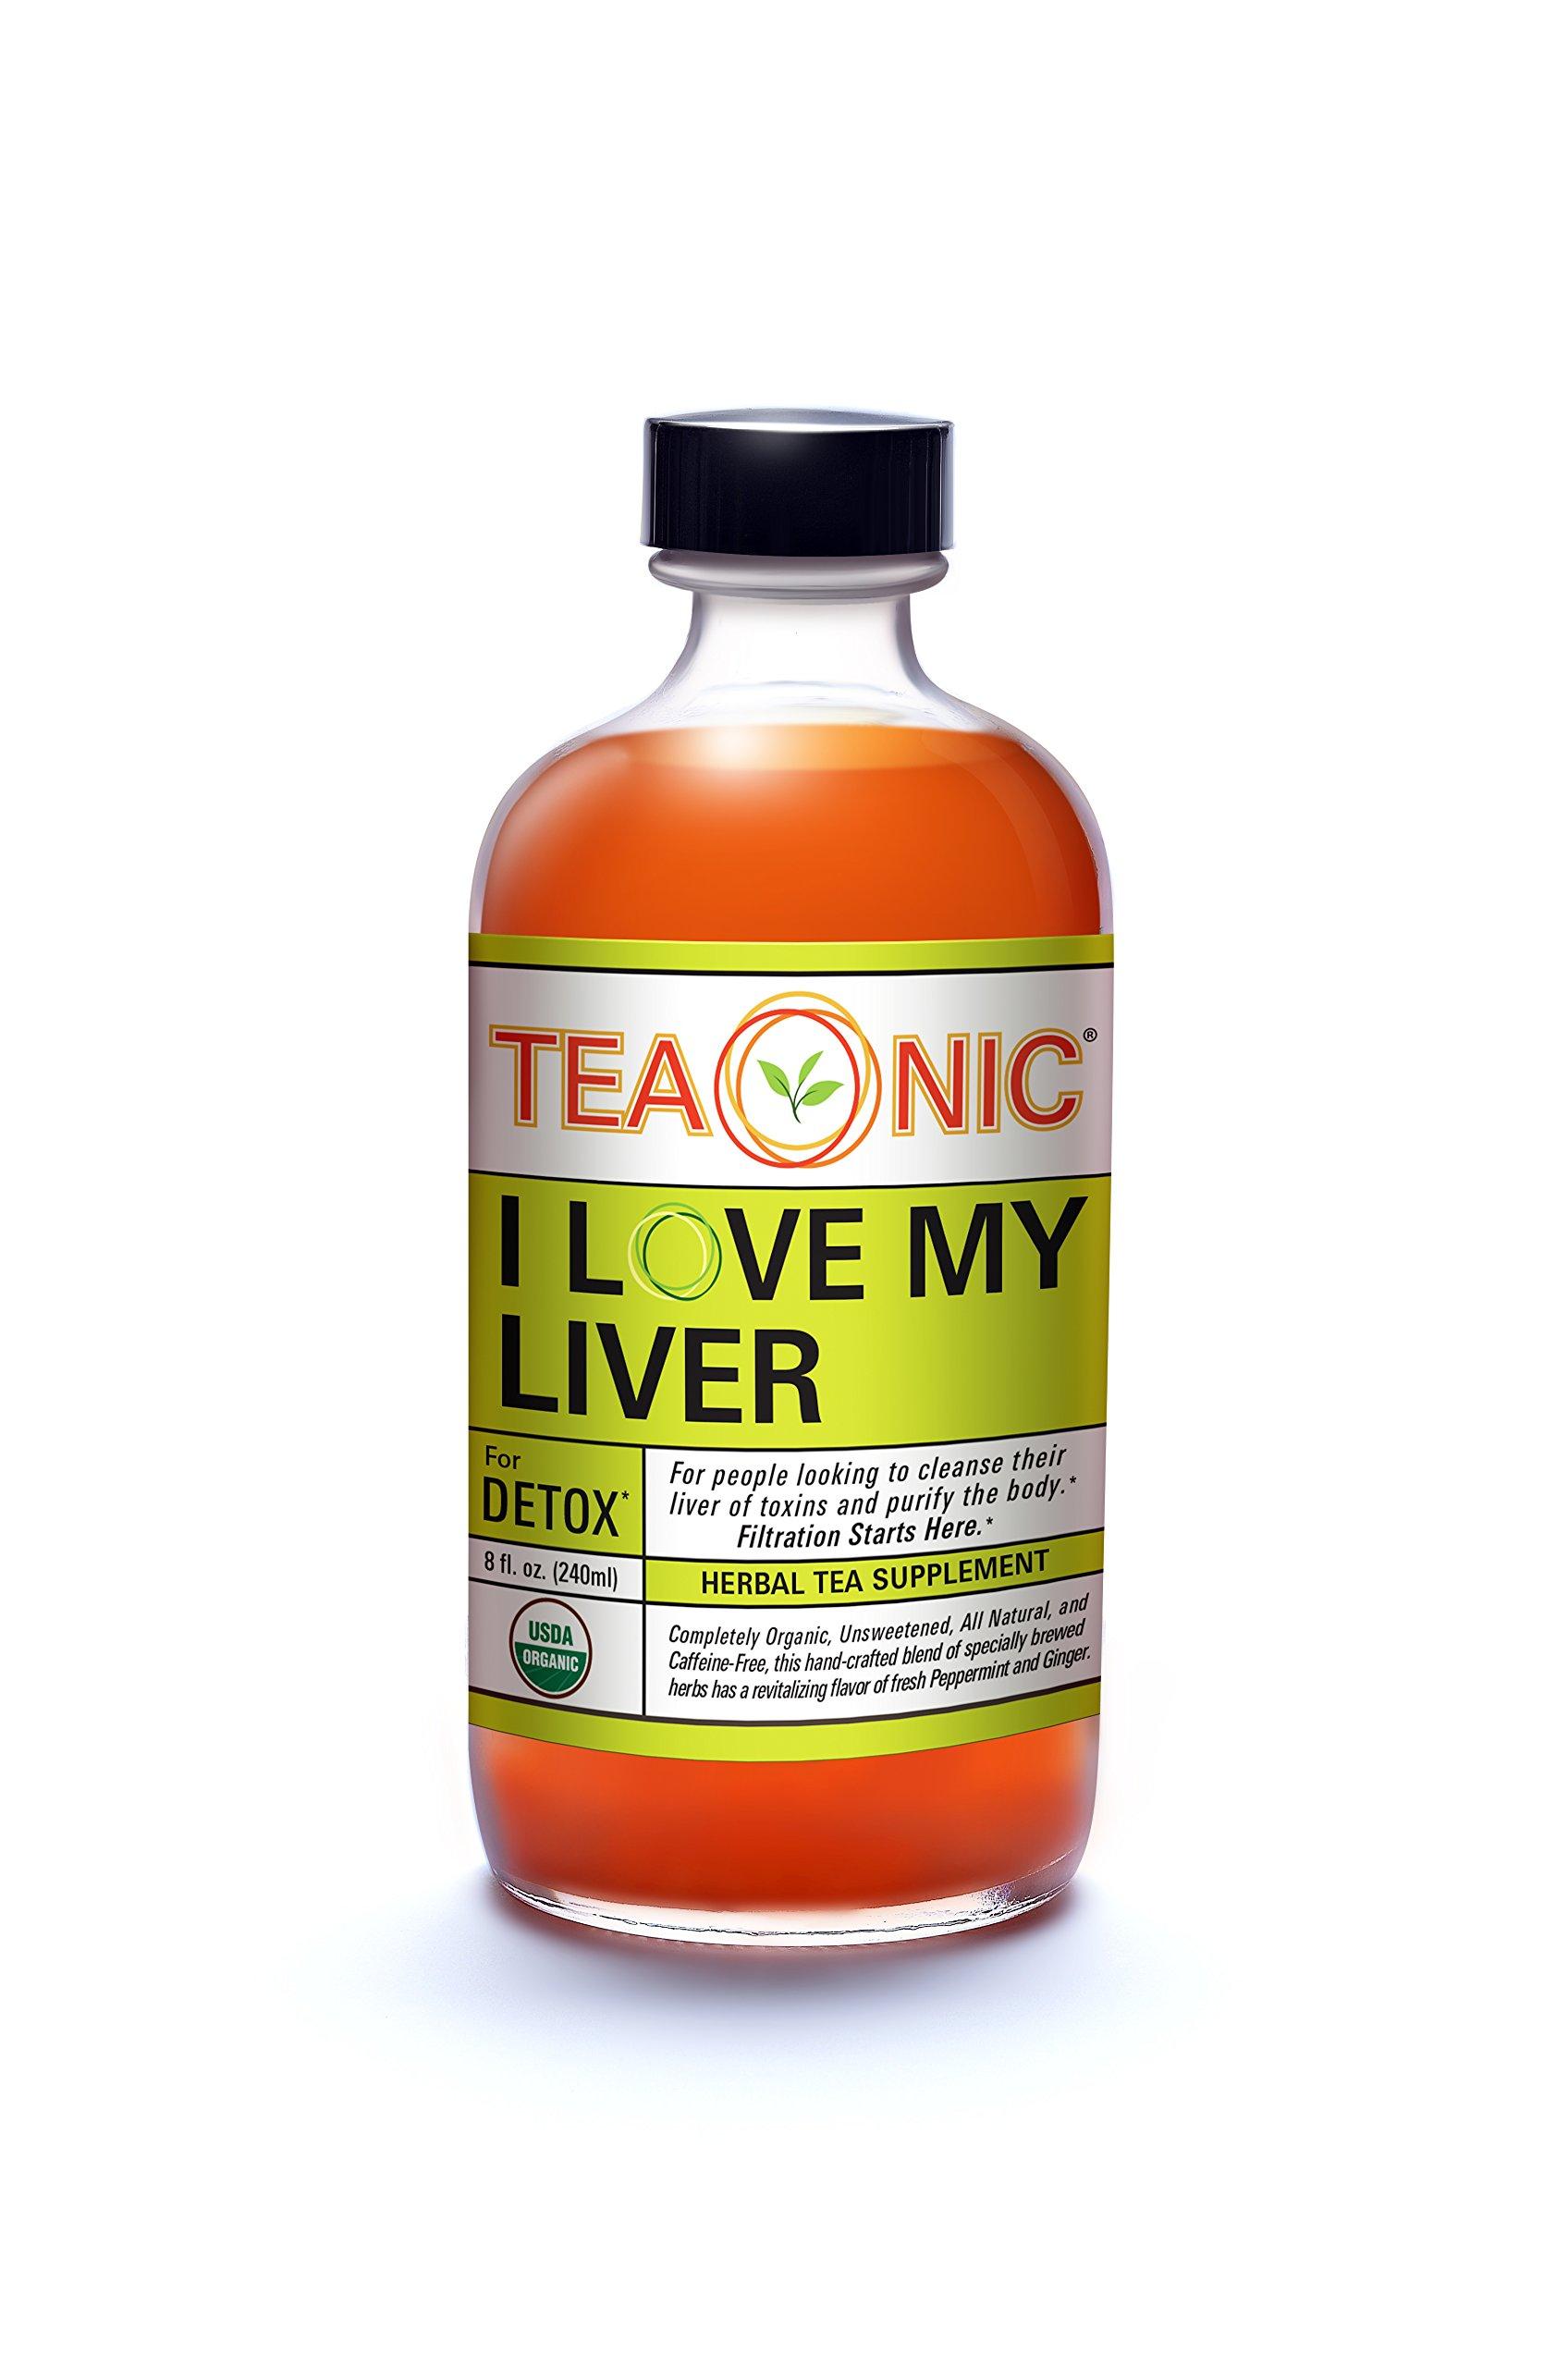 Teaonic I LOVE MY LIVER for Detox Bottled Herbal Tea Supplement, 8oz(12 Pack)